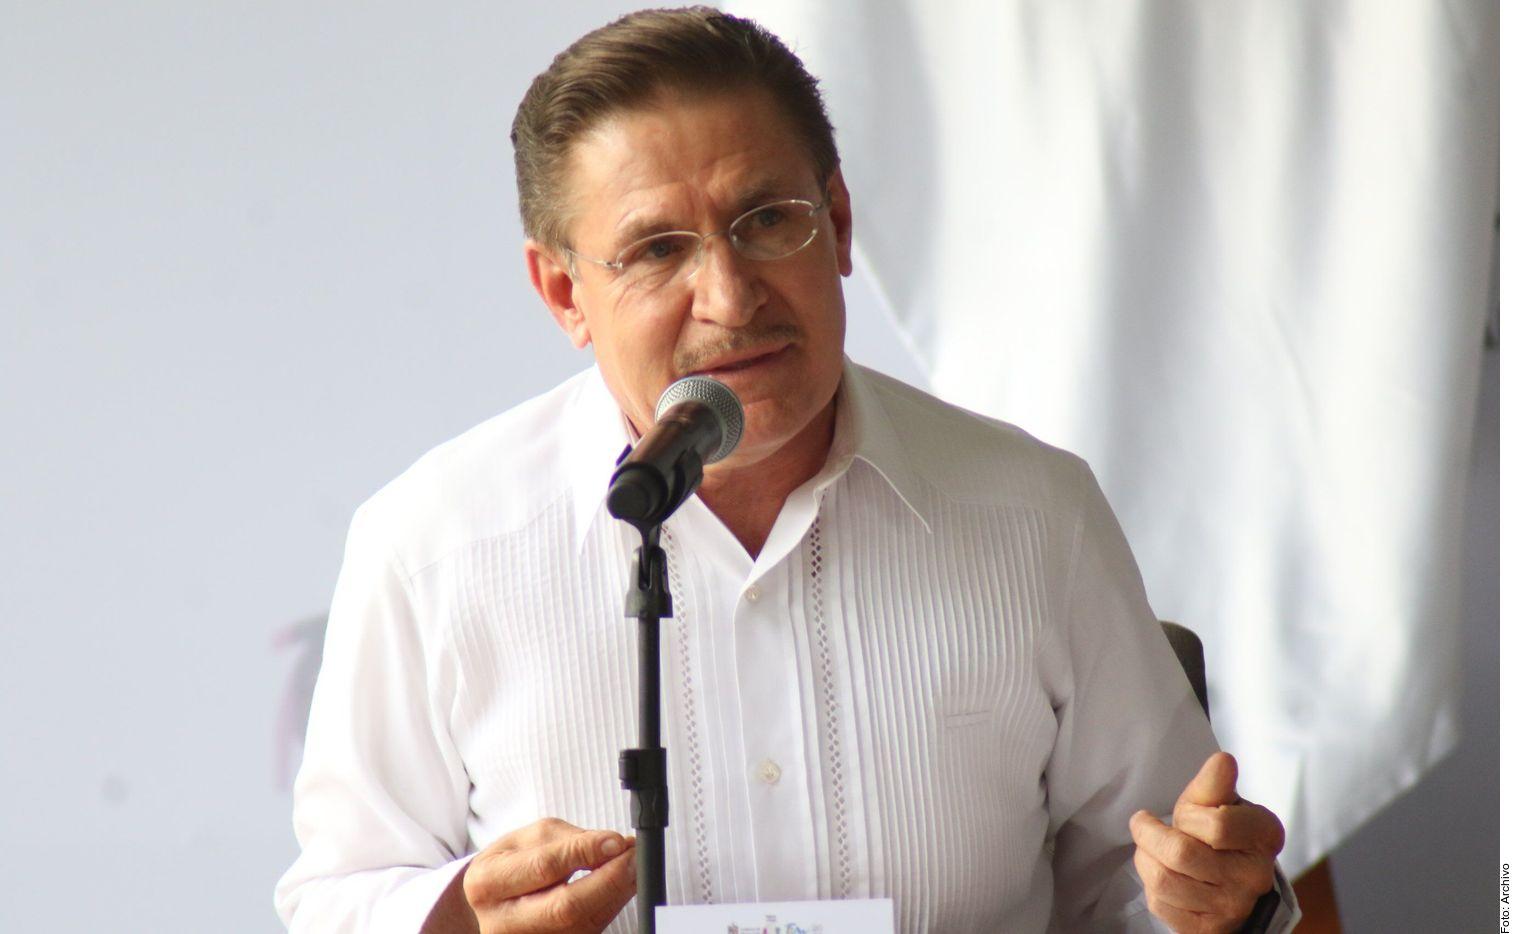 José Rosas Aispuro, gobernador de Durango, tiene coronavirus.